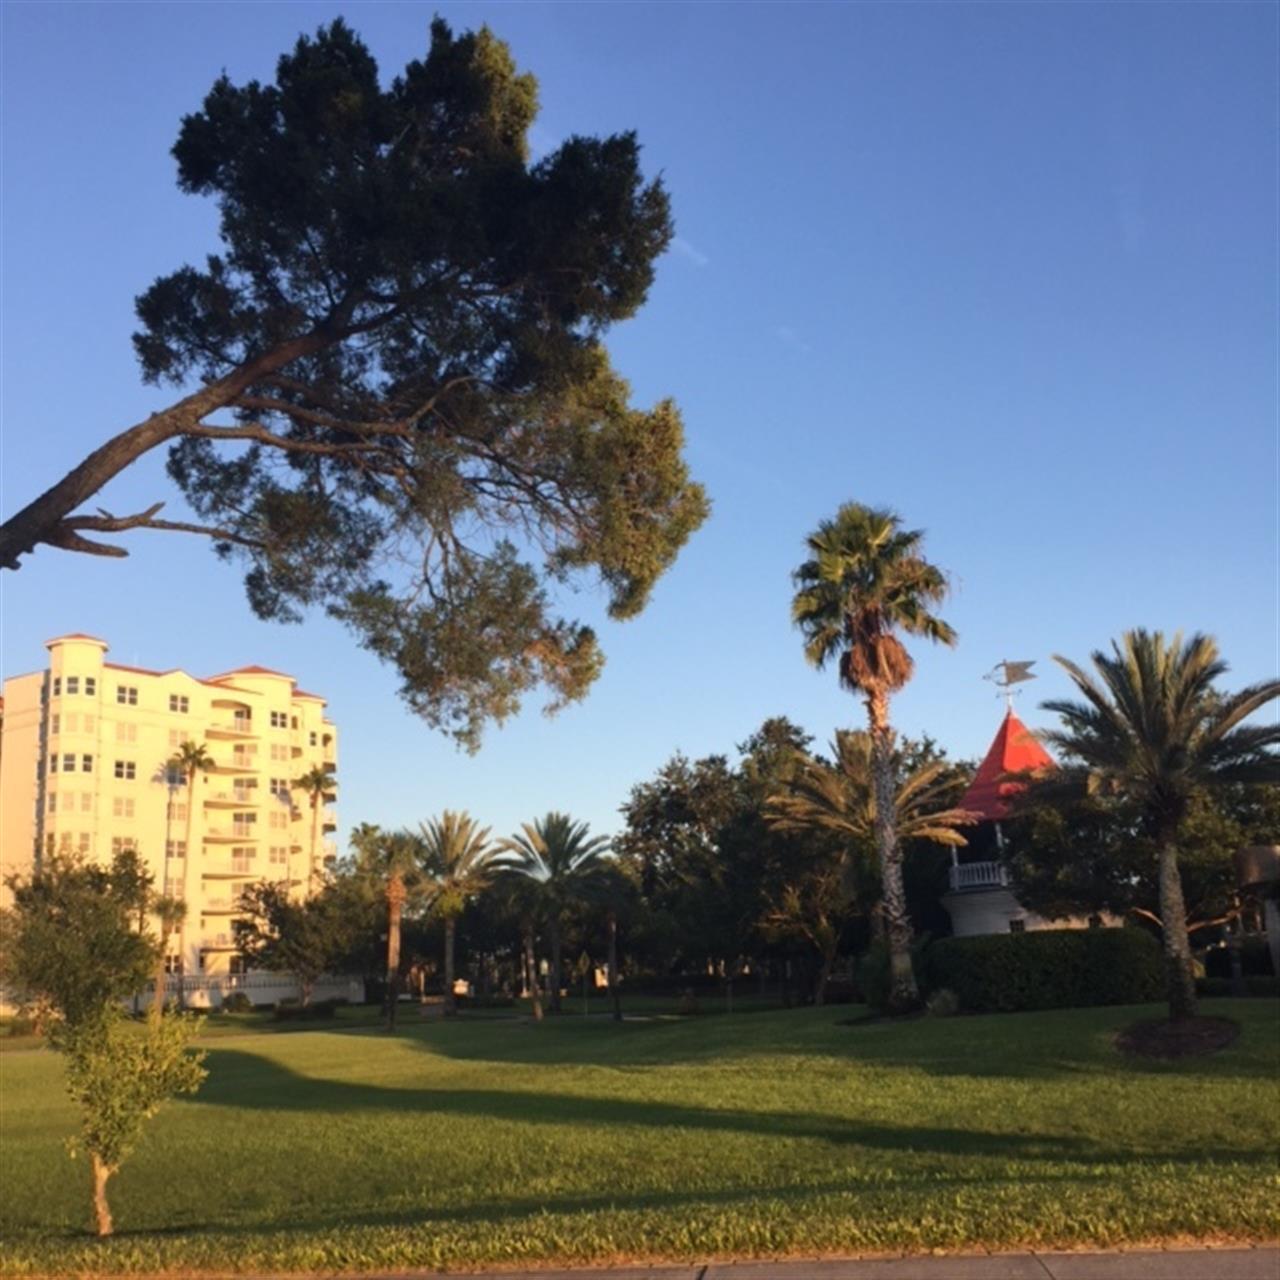 Fortunato Park Ormond Beach, Florida